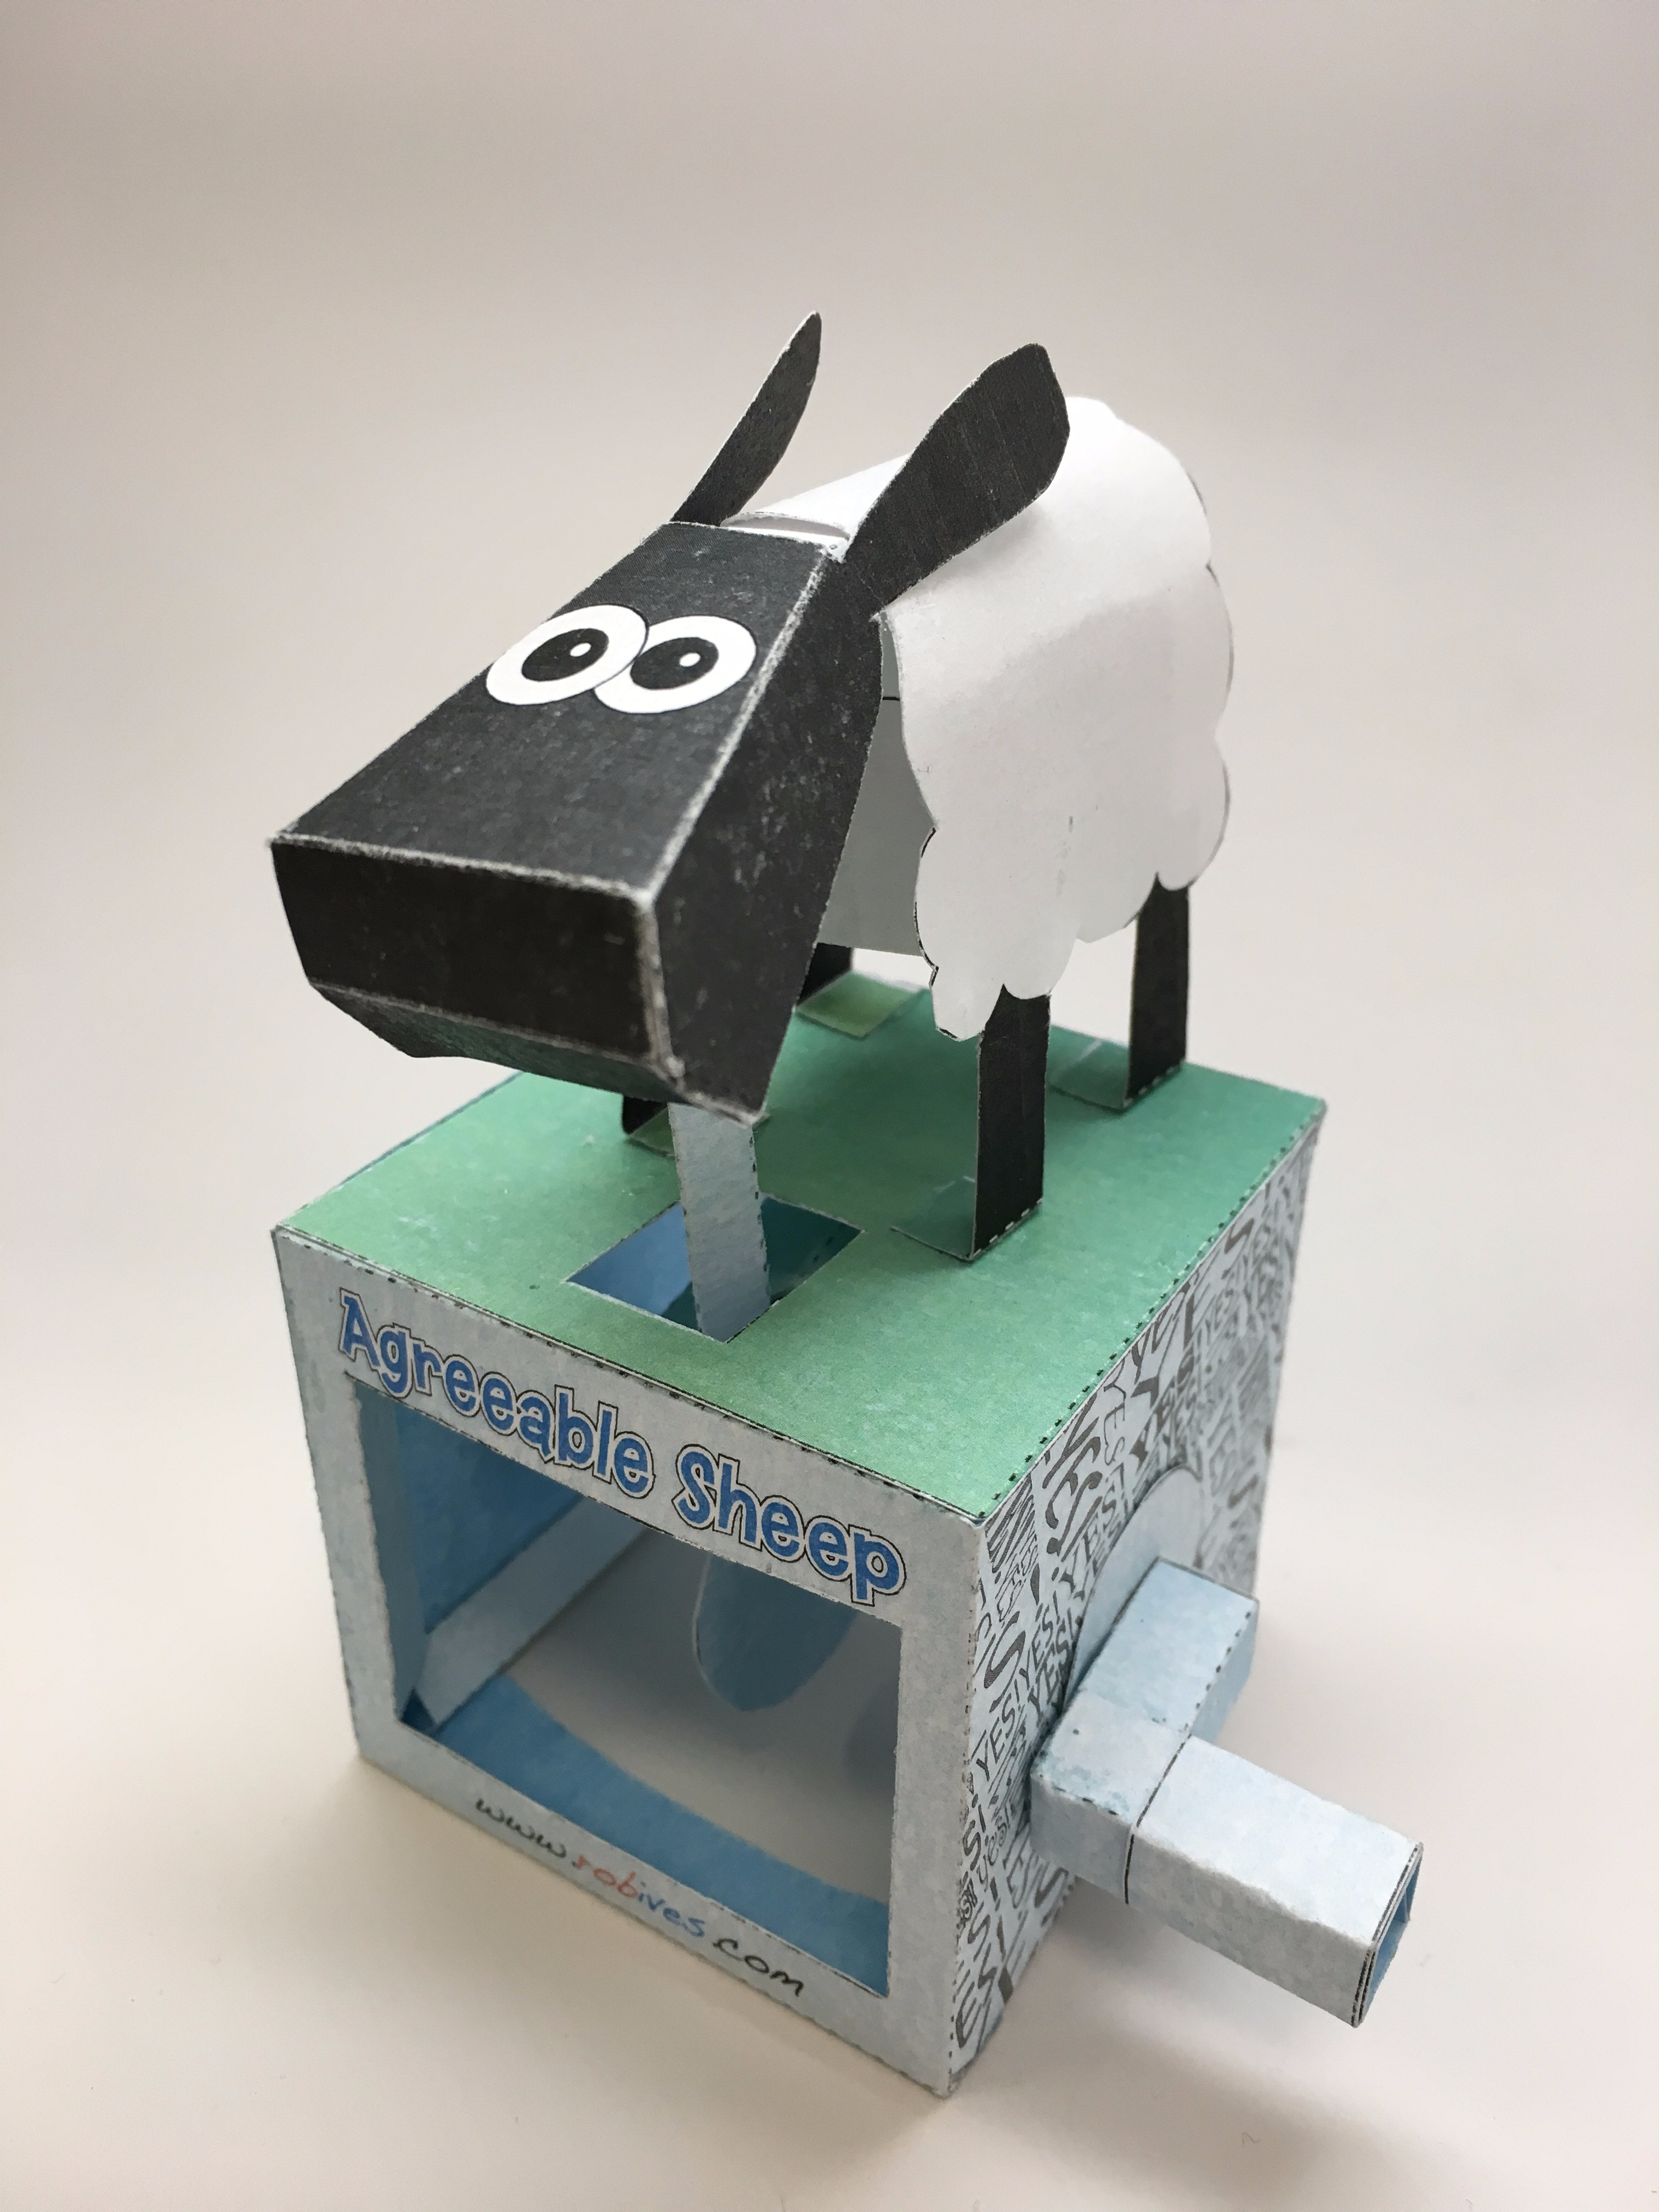 Agreeable Sheep